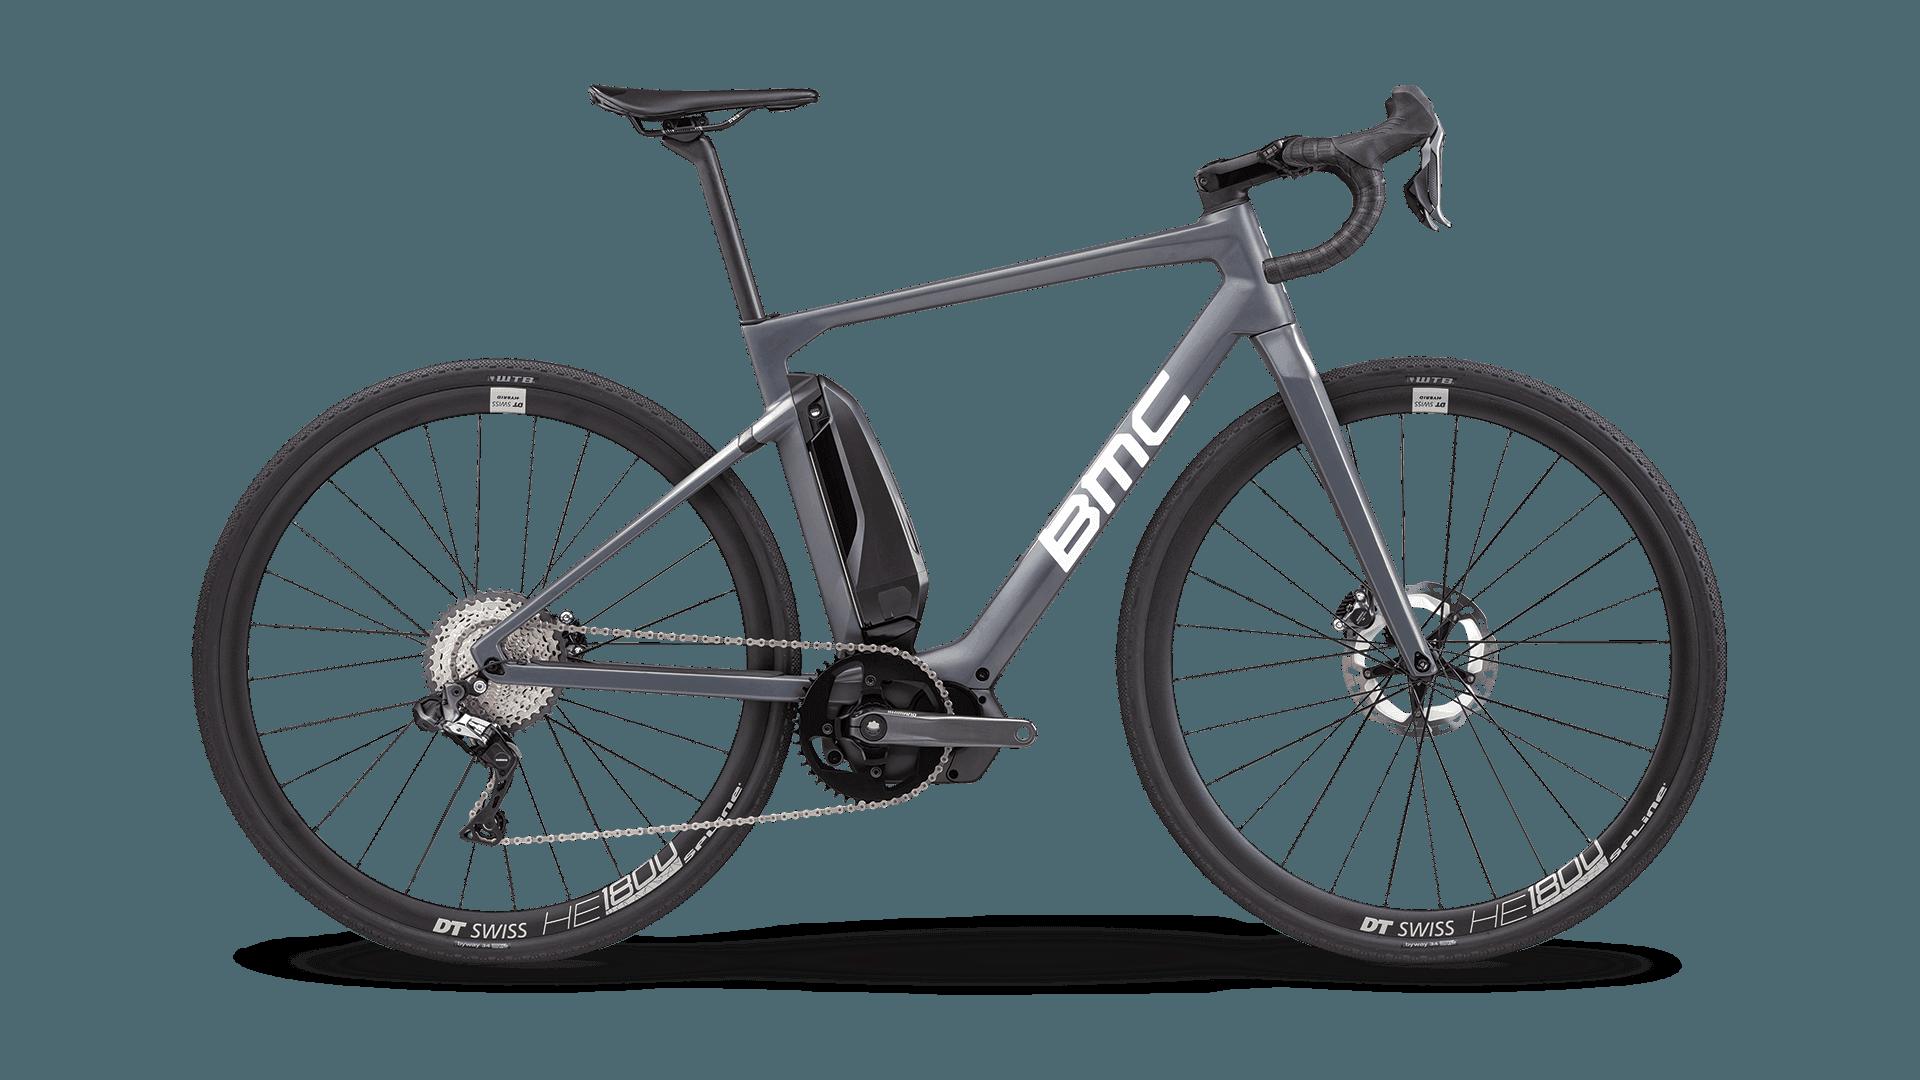 A Grey BMC electric assisted road bike